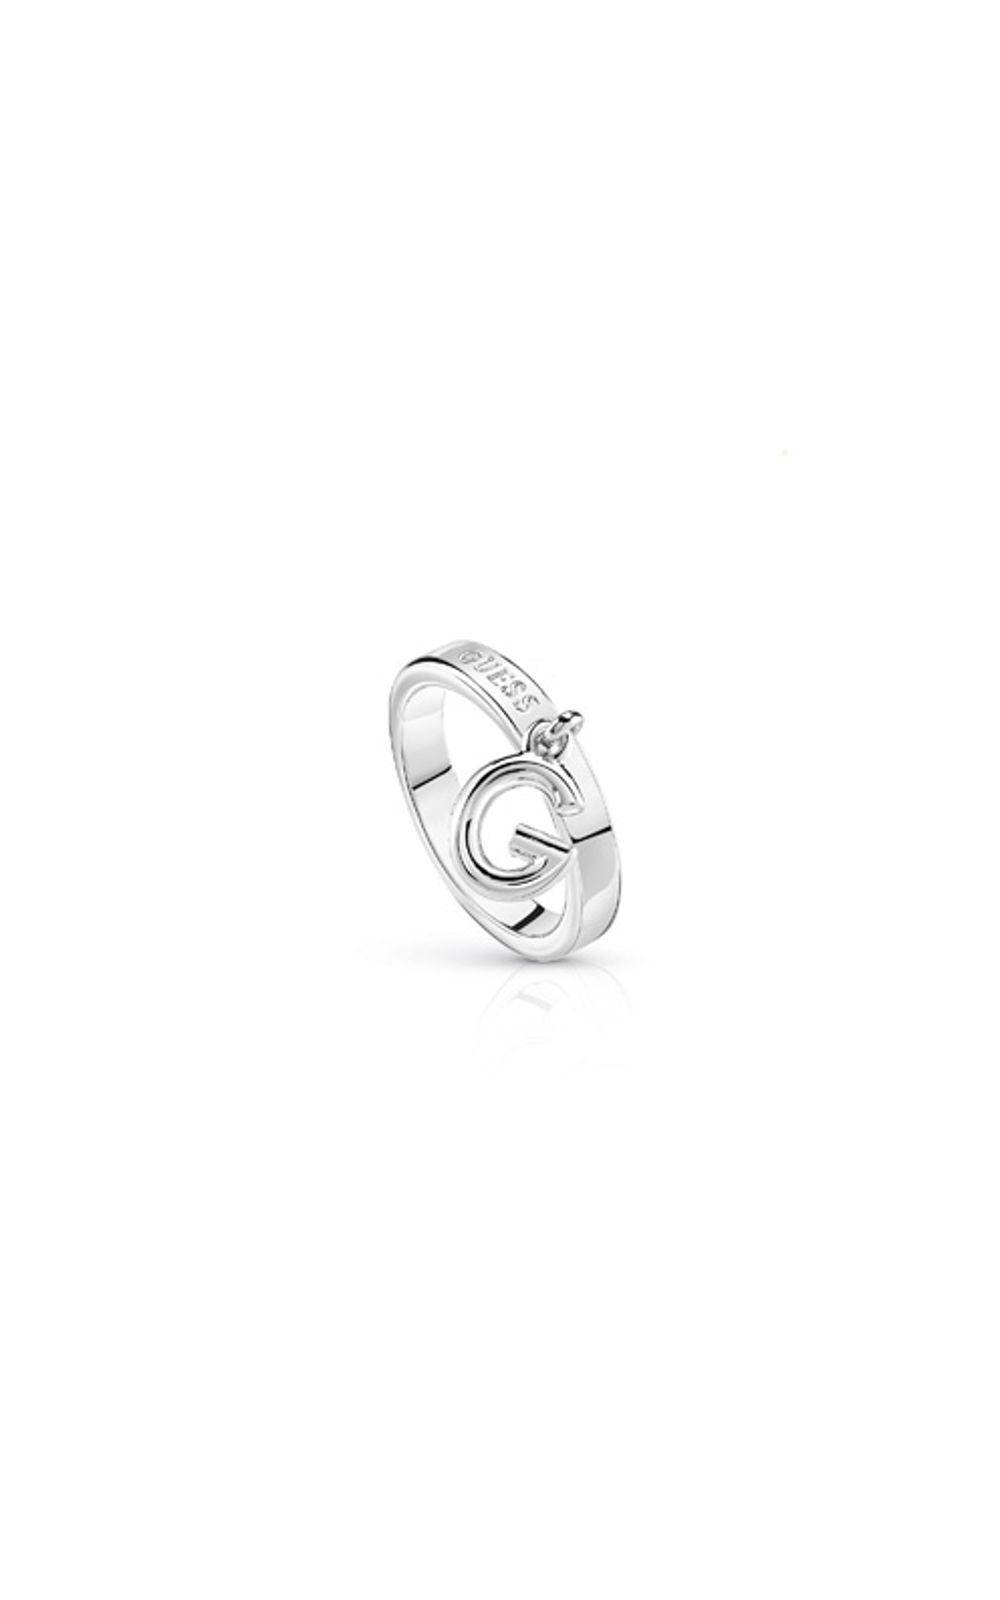 GUESS FAUX UBR84018-54 Ασημένιο Δαχτυλίδι Με Charm